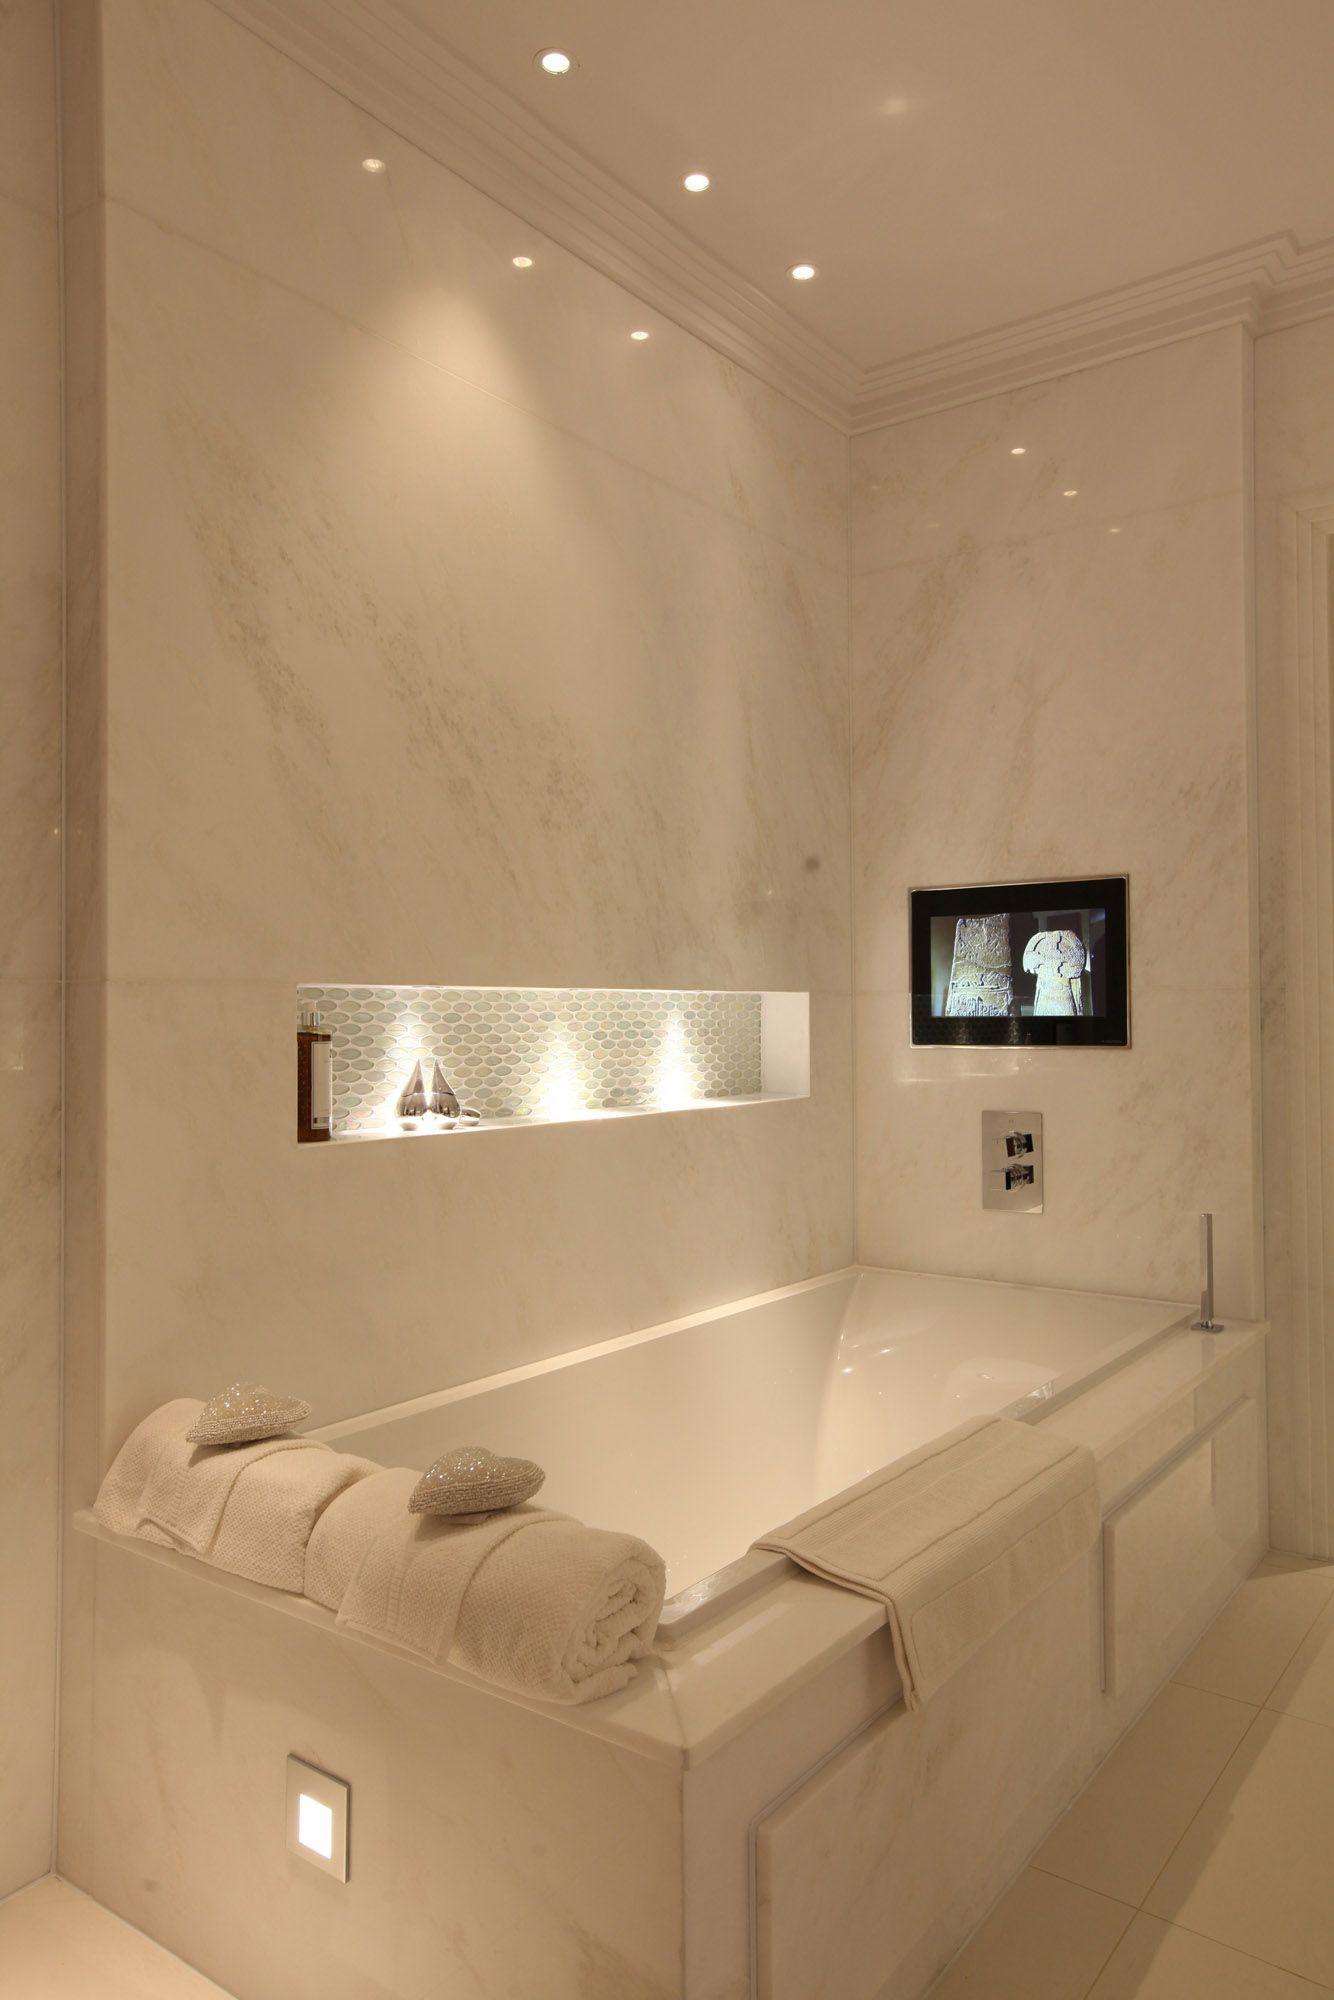 Bathroom Light (8)   Bathroom   Pinterest   Lights and House